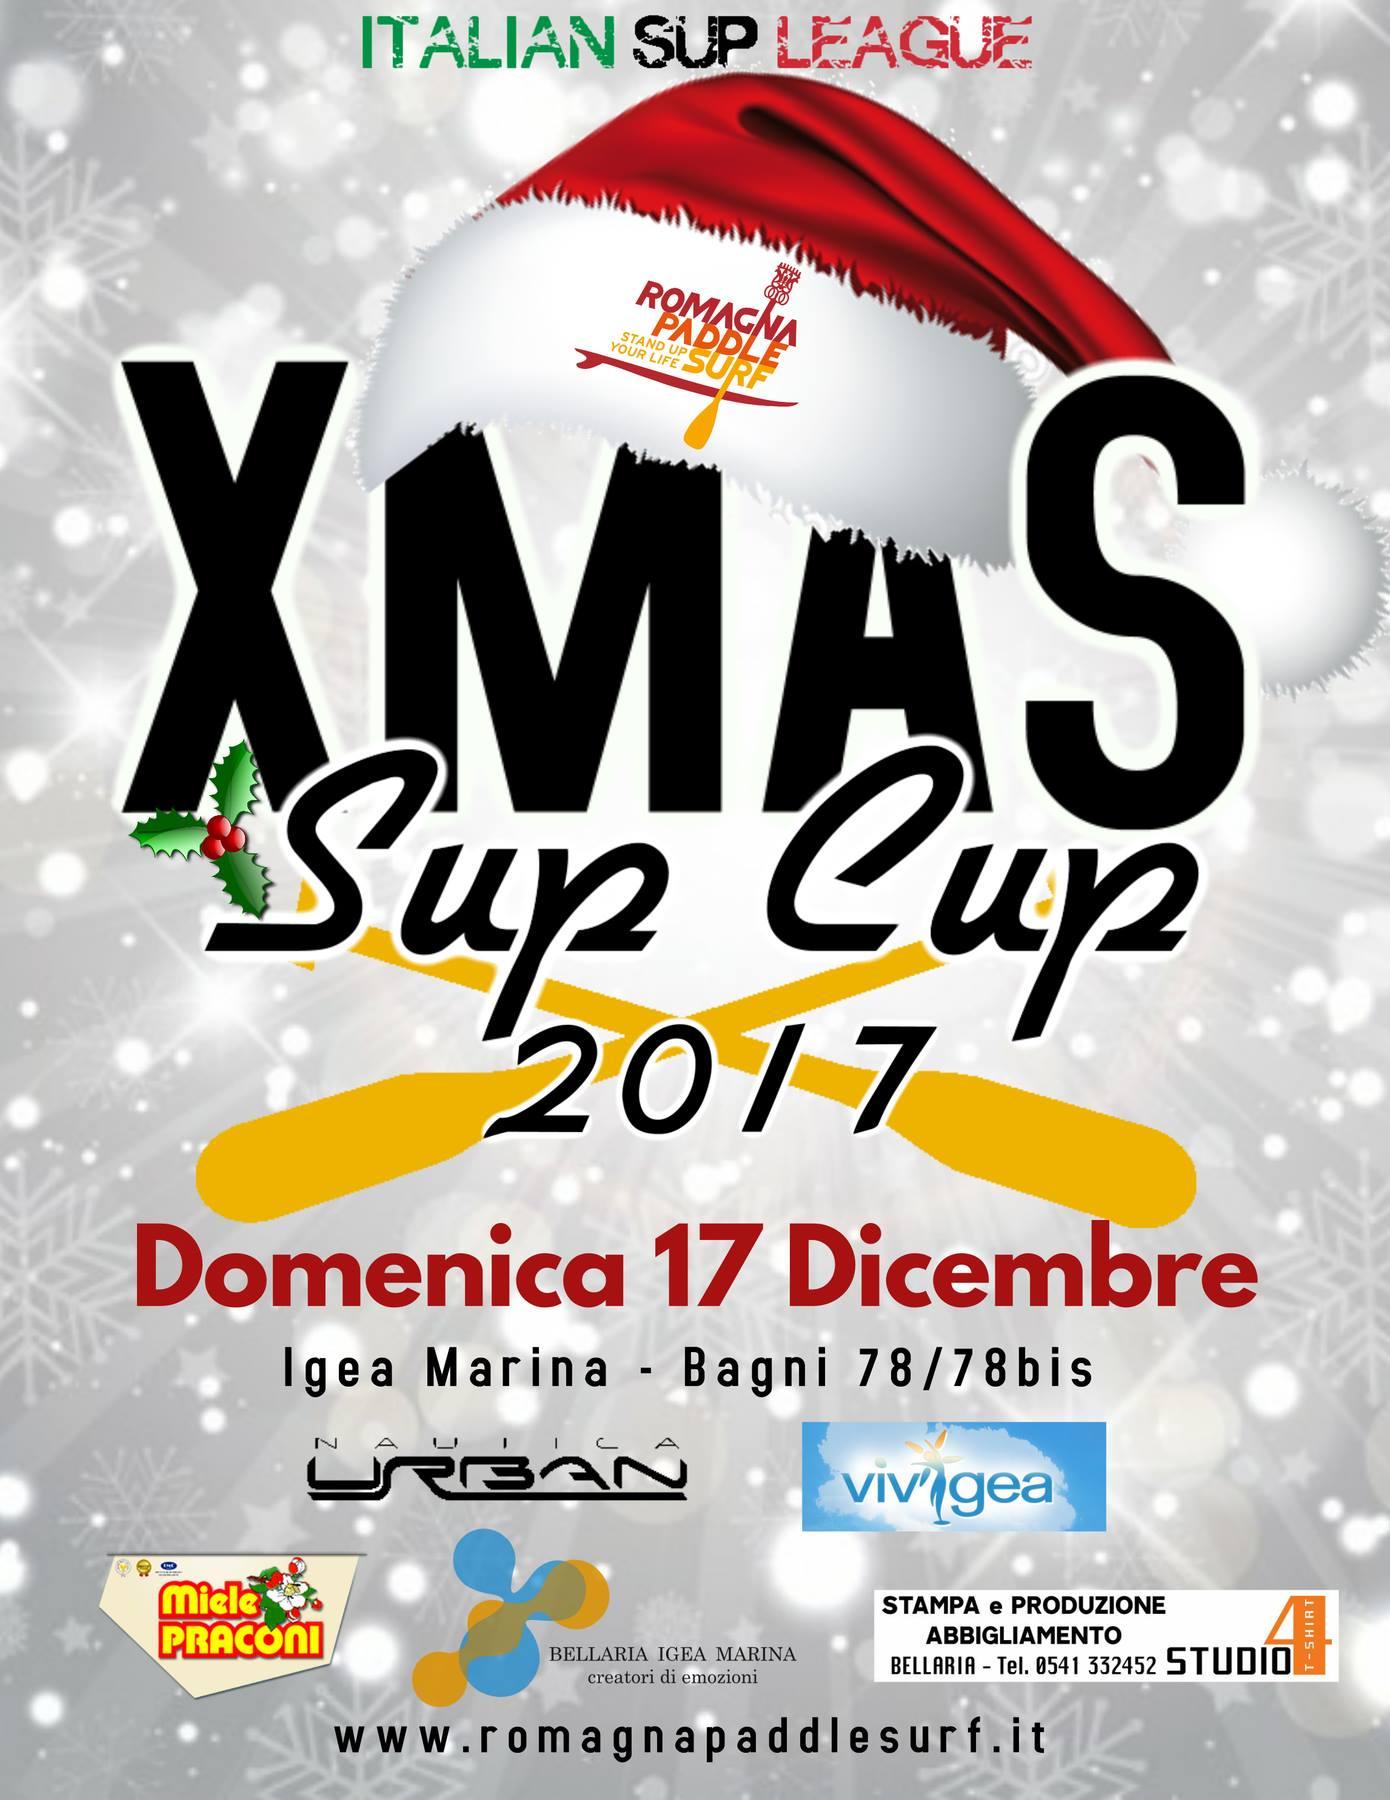 sup-news-2017-xmas-sup-cup